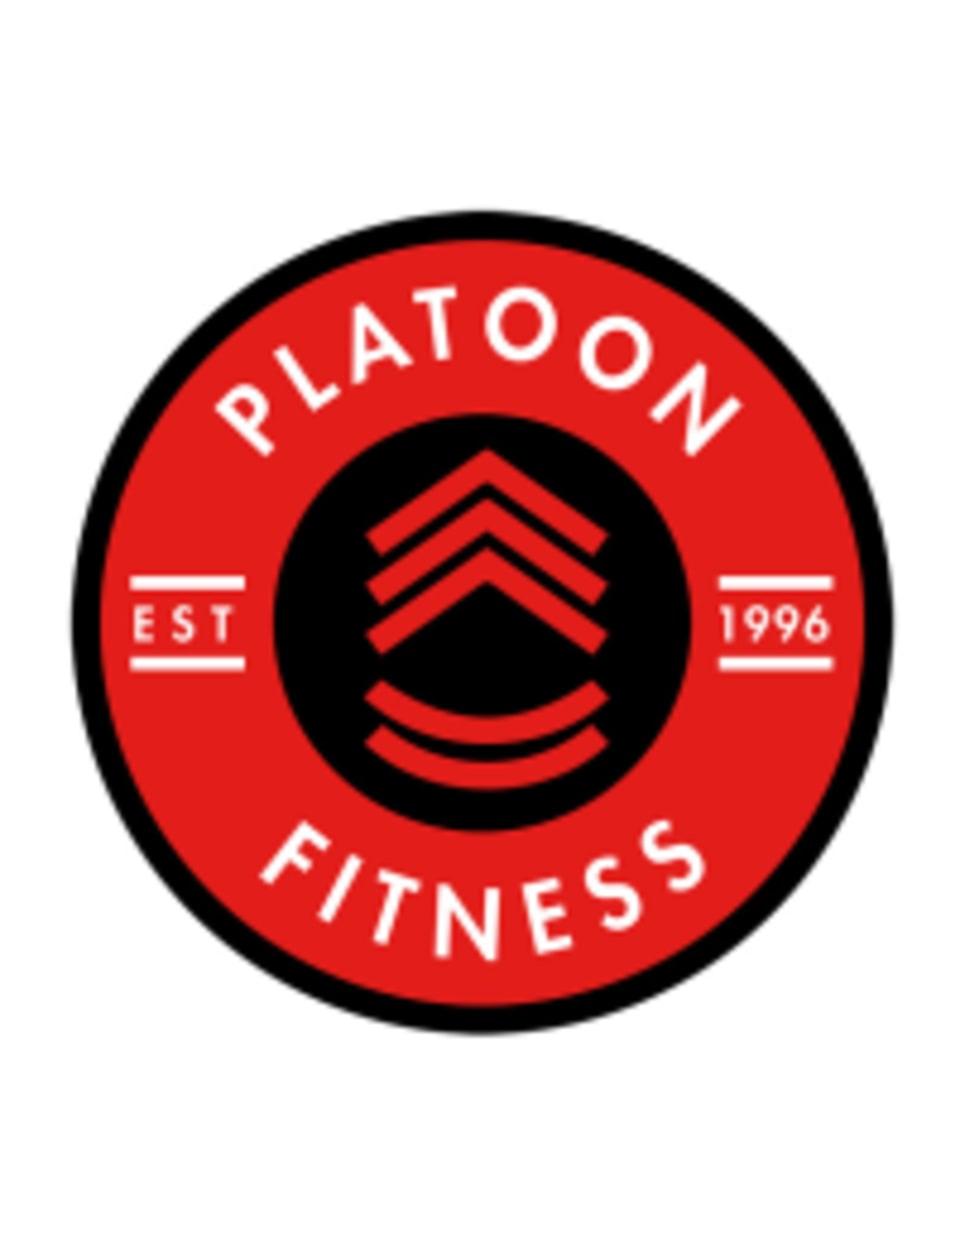 Platoon Fitness logo